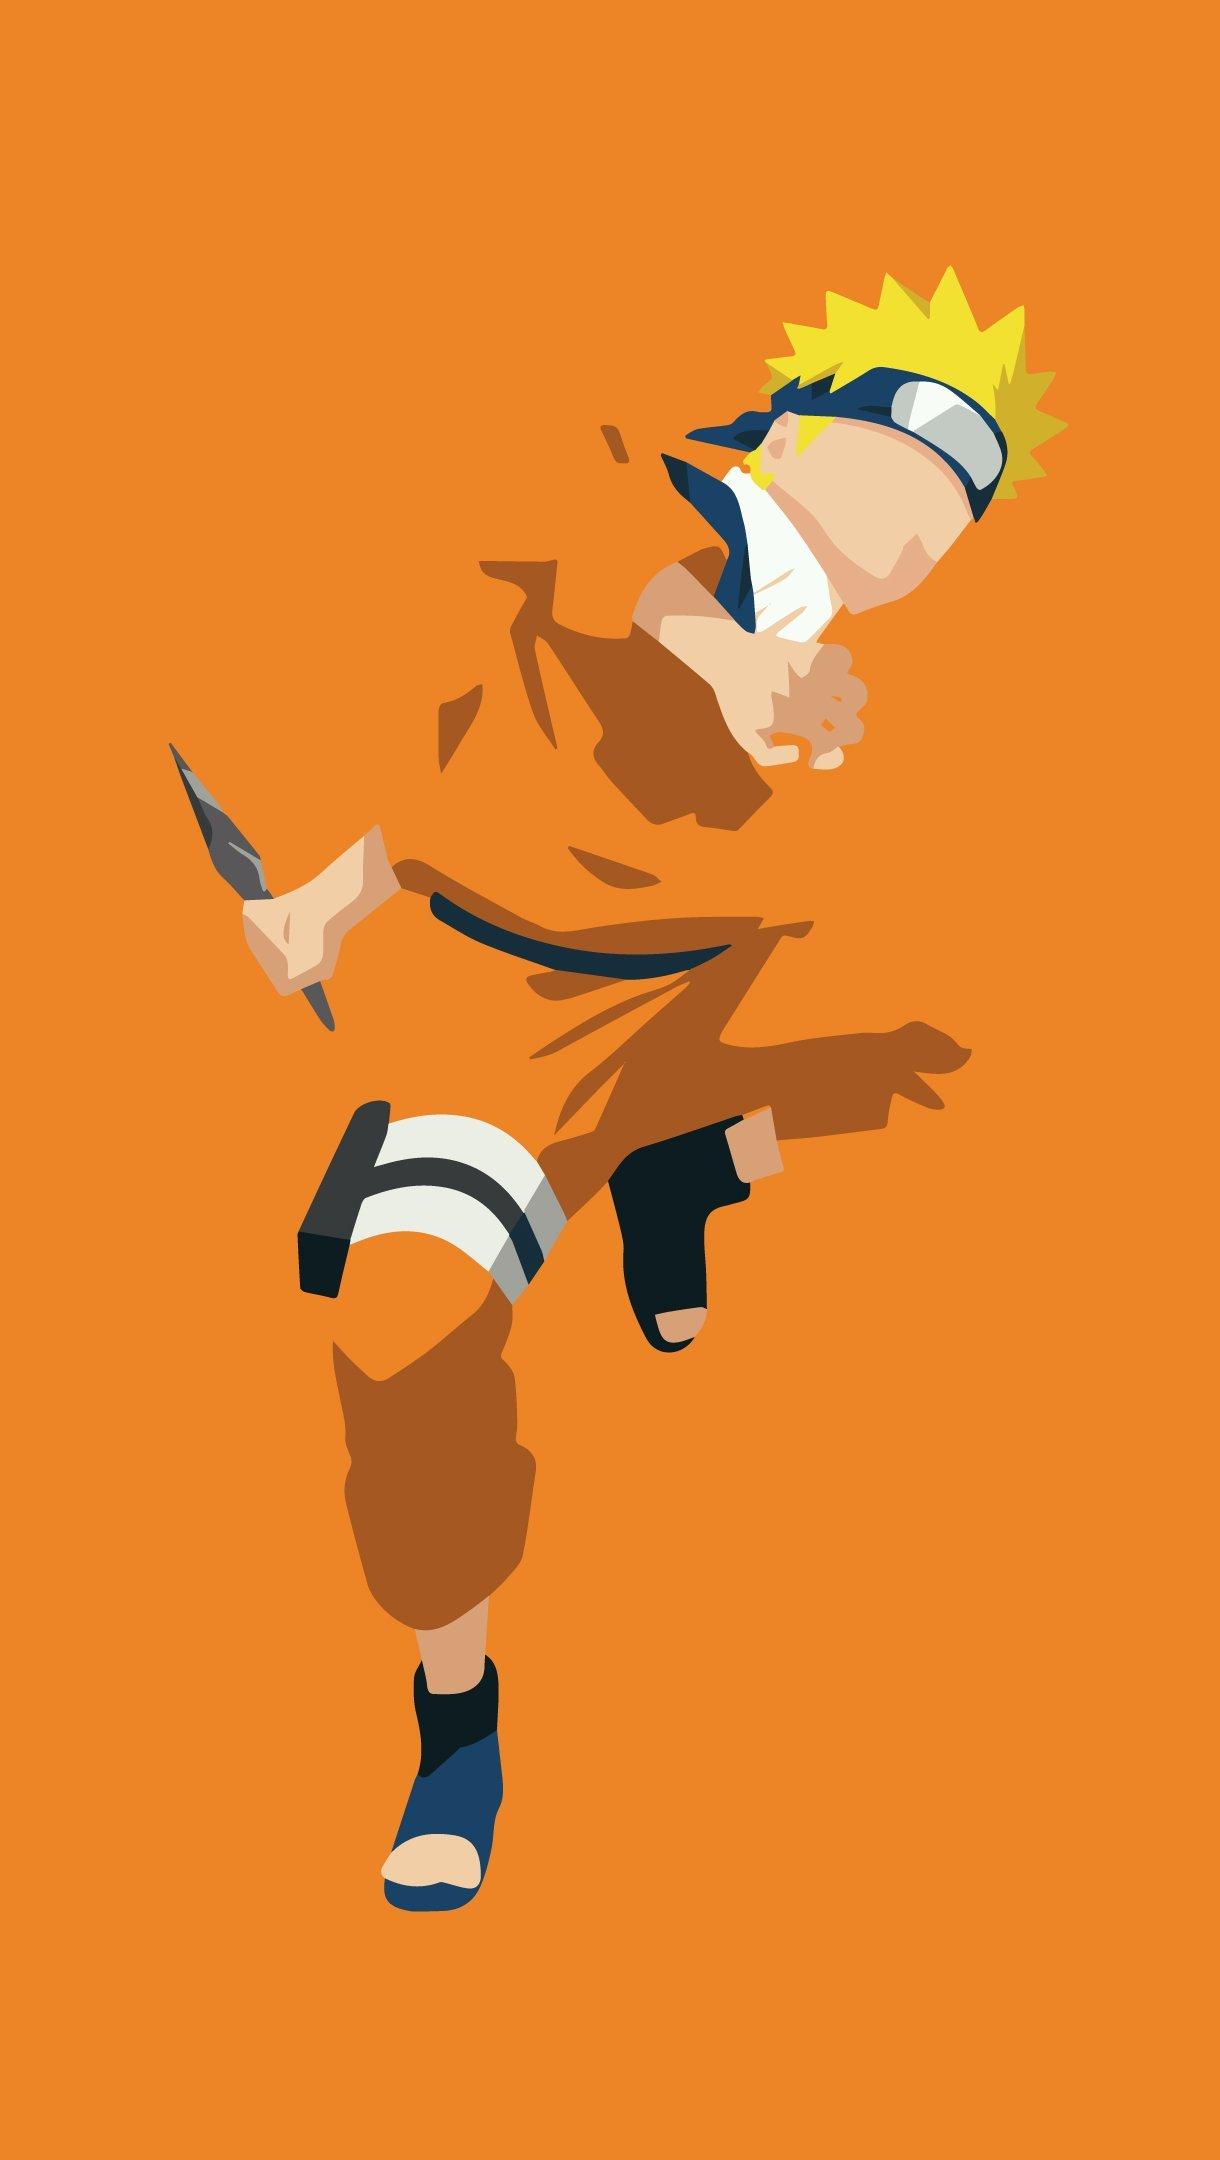 Fondos de pantalla Anime Naruto Uzumaki Minimalista Vertical